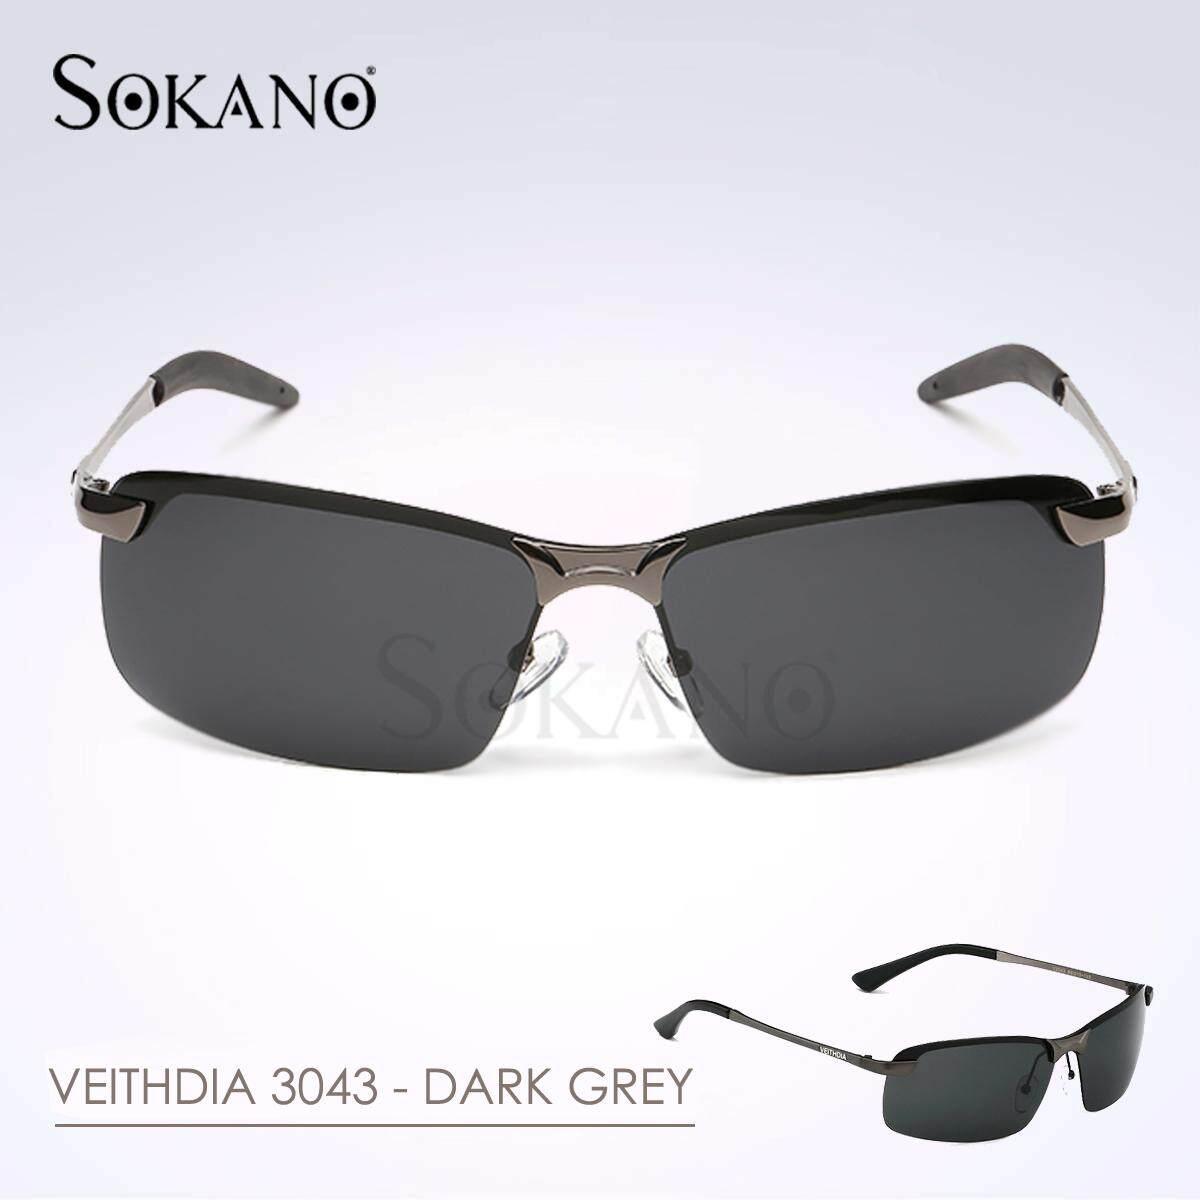 (RAYA 2019) VEITHDIA 3043 Polarized Aviator Design Men Sunglasses- Dark Grey